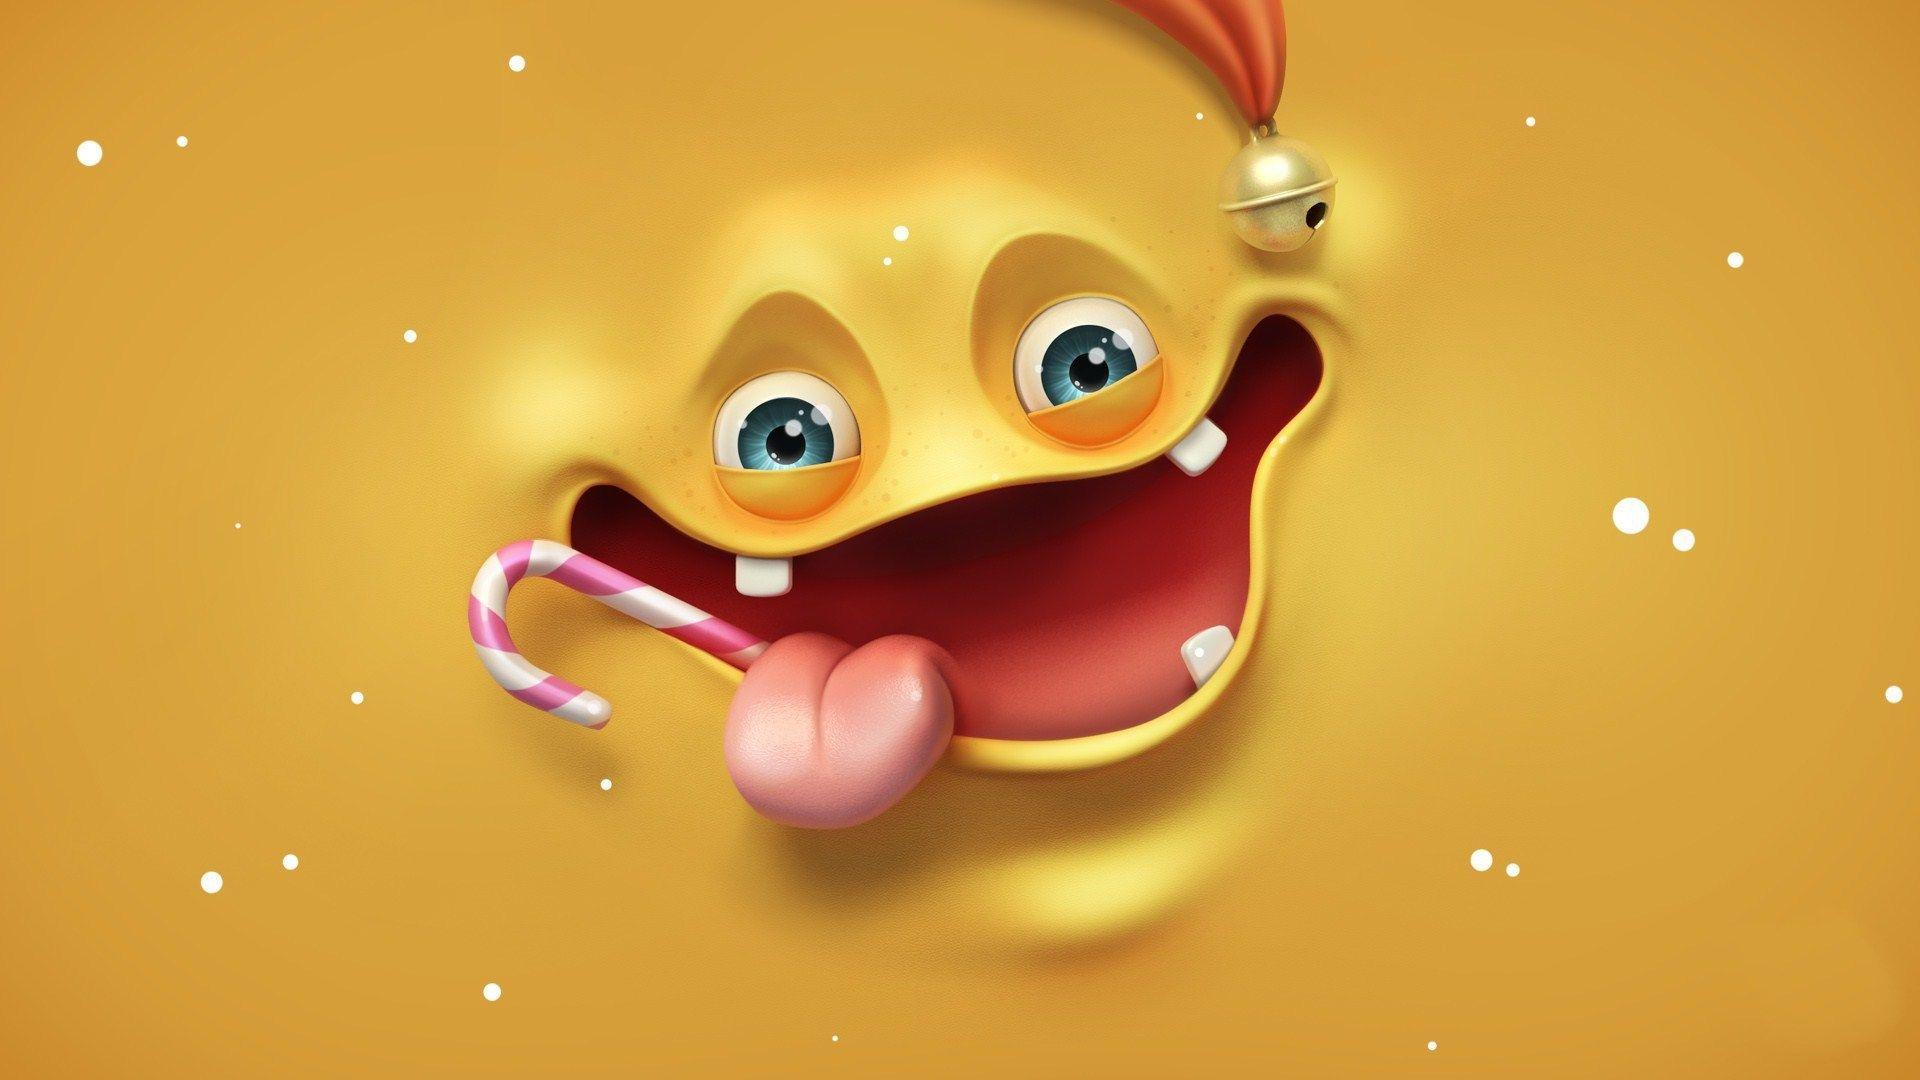 Download Funny 3d Cartoon Wallpaper Free In 2020 Funny Wallpapers Cartoon Wallpaper Funny Wallpaper